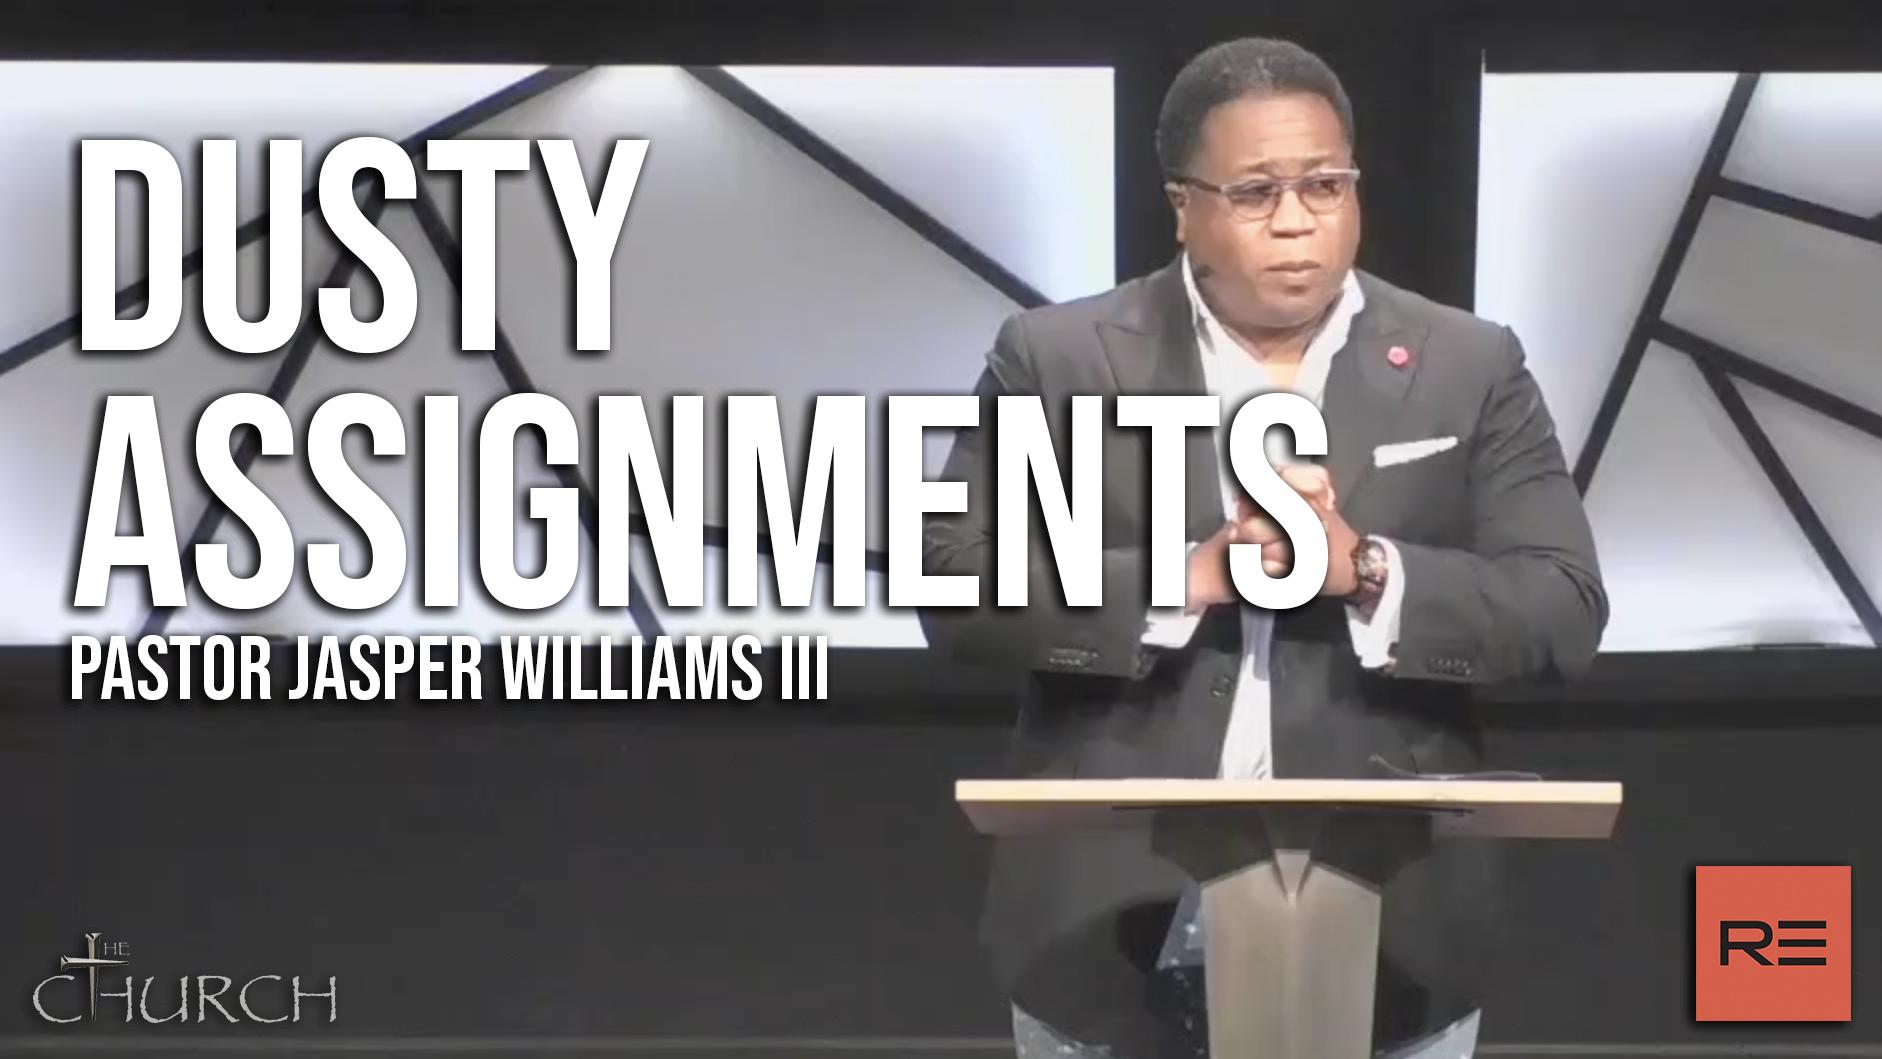 Dusty Assignments | Pastor Jasper Williams III